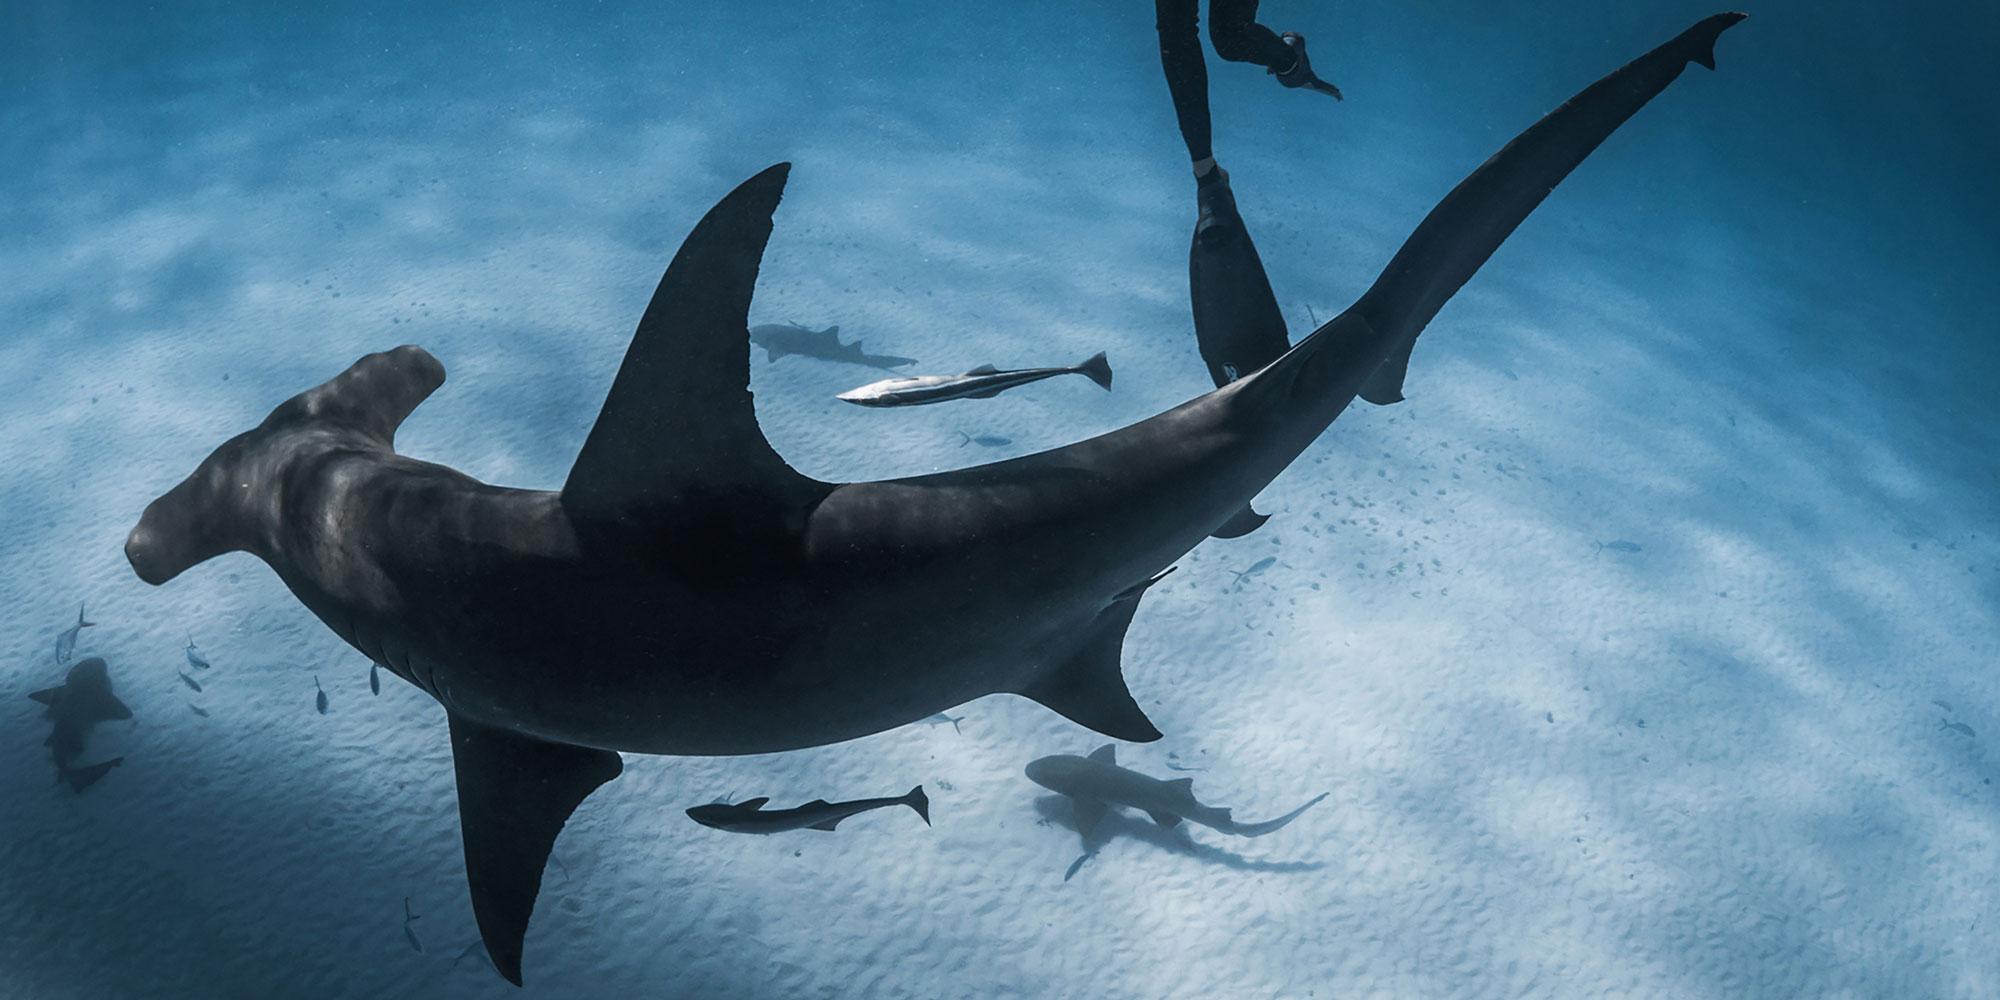 Jillian Freediving With Great Hammerhead Sharks, Camera, Underwater, wetsuit, Diving